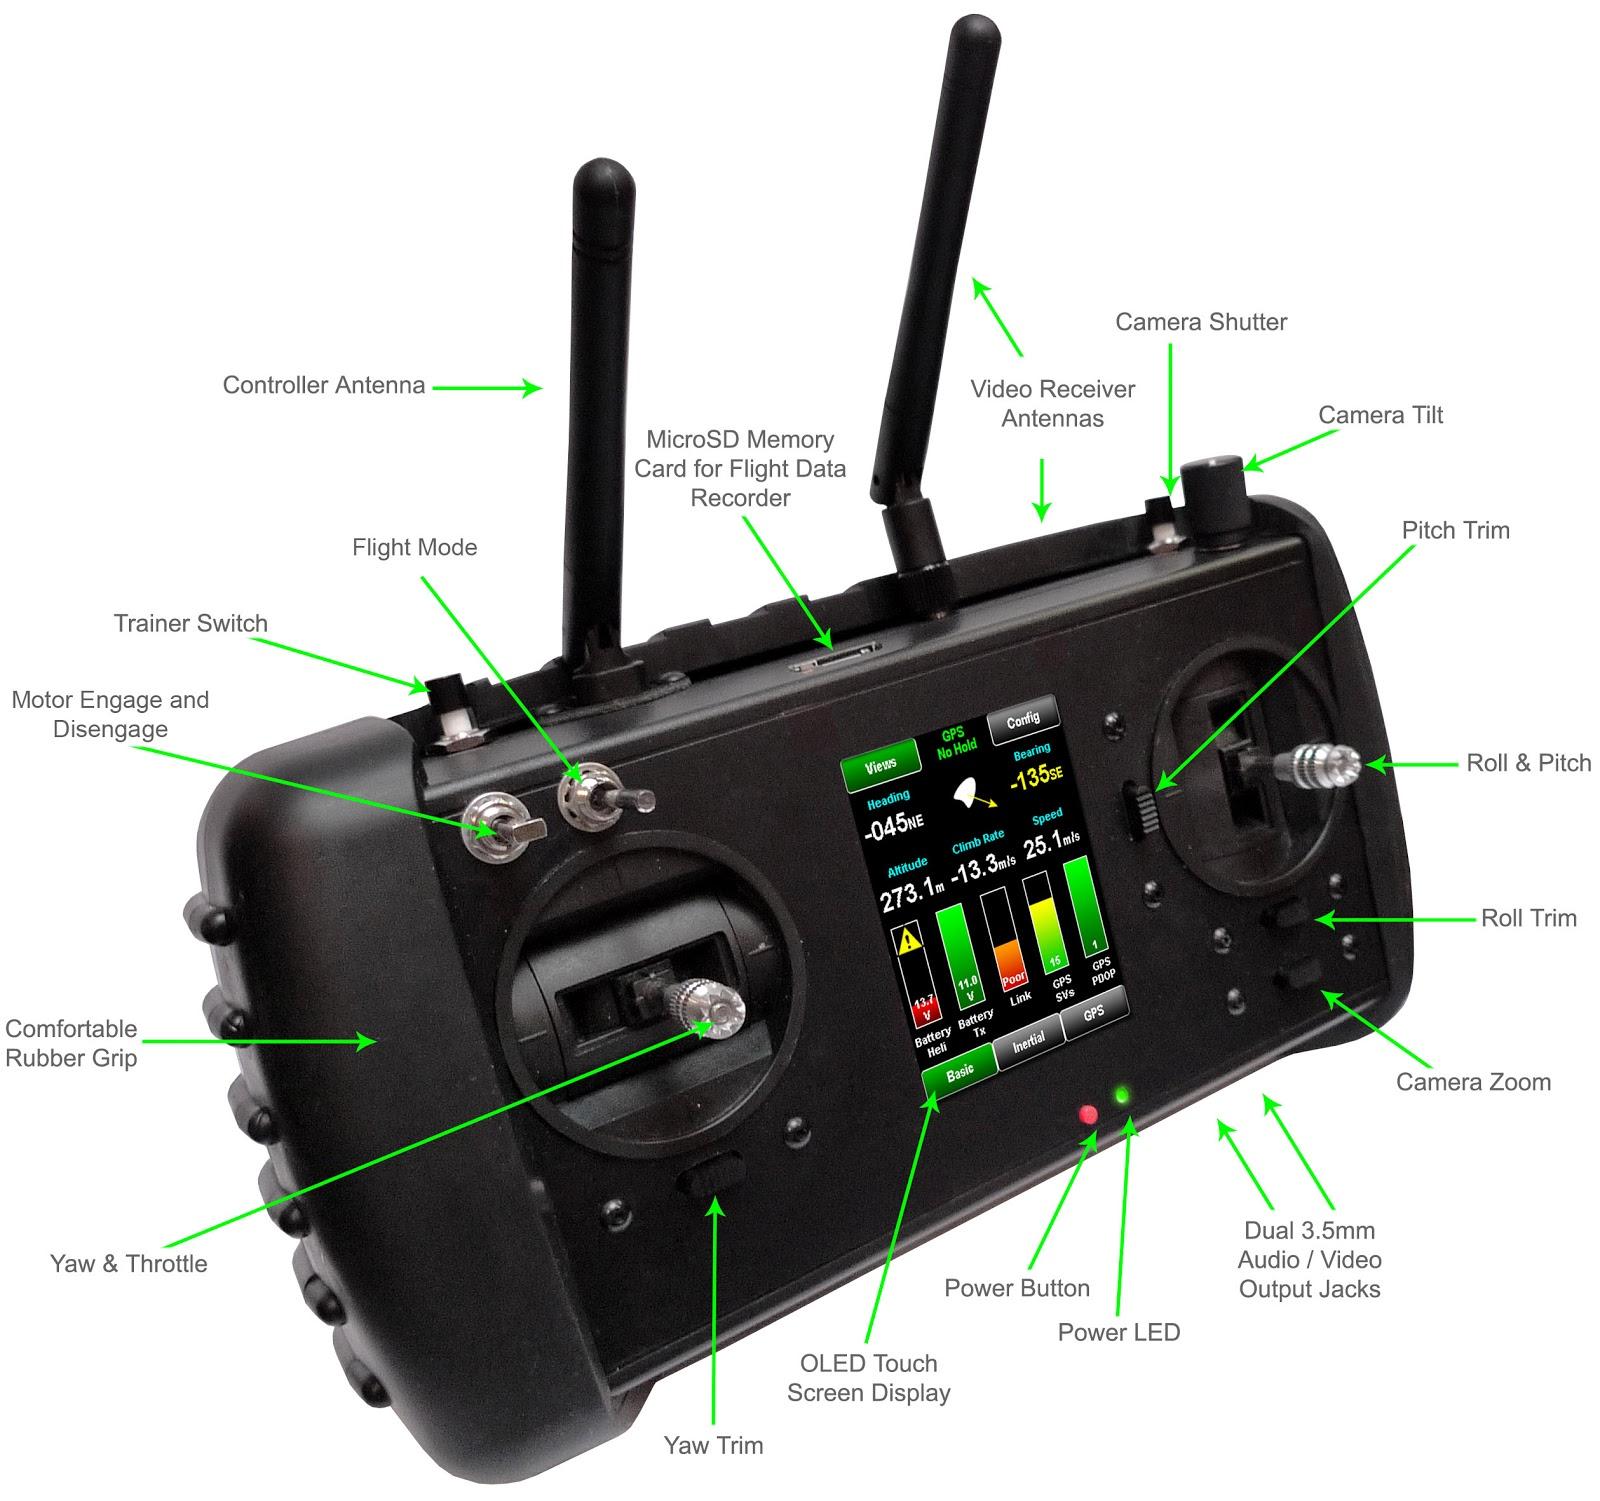 revo camera wiring diagram harley tach wiring RJ11 Pinout  Revo Camera System Installation Revo Security Camera Internal Alarm Revo Camera Pinout